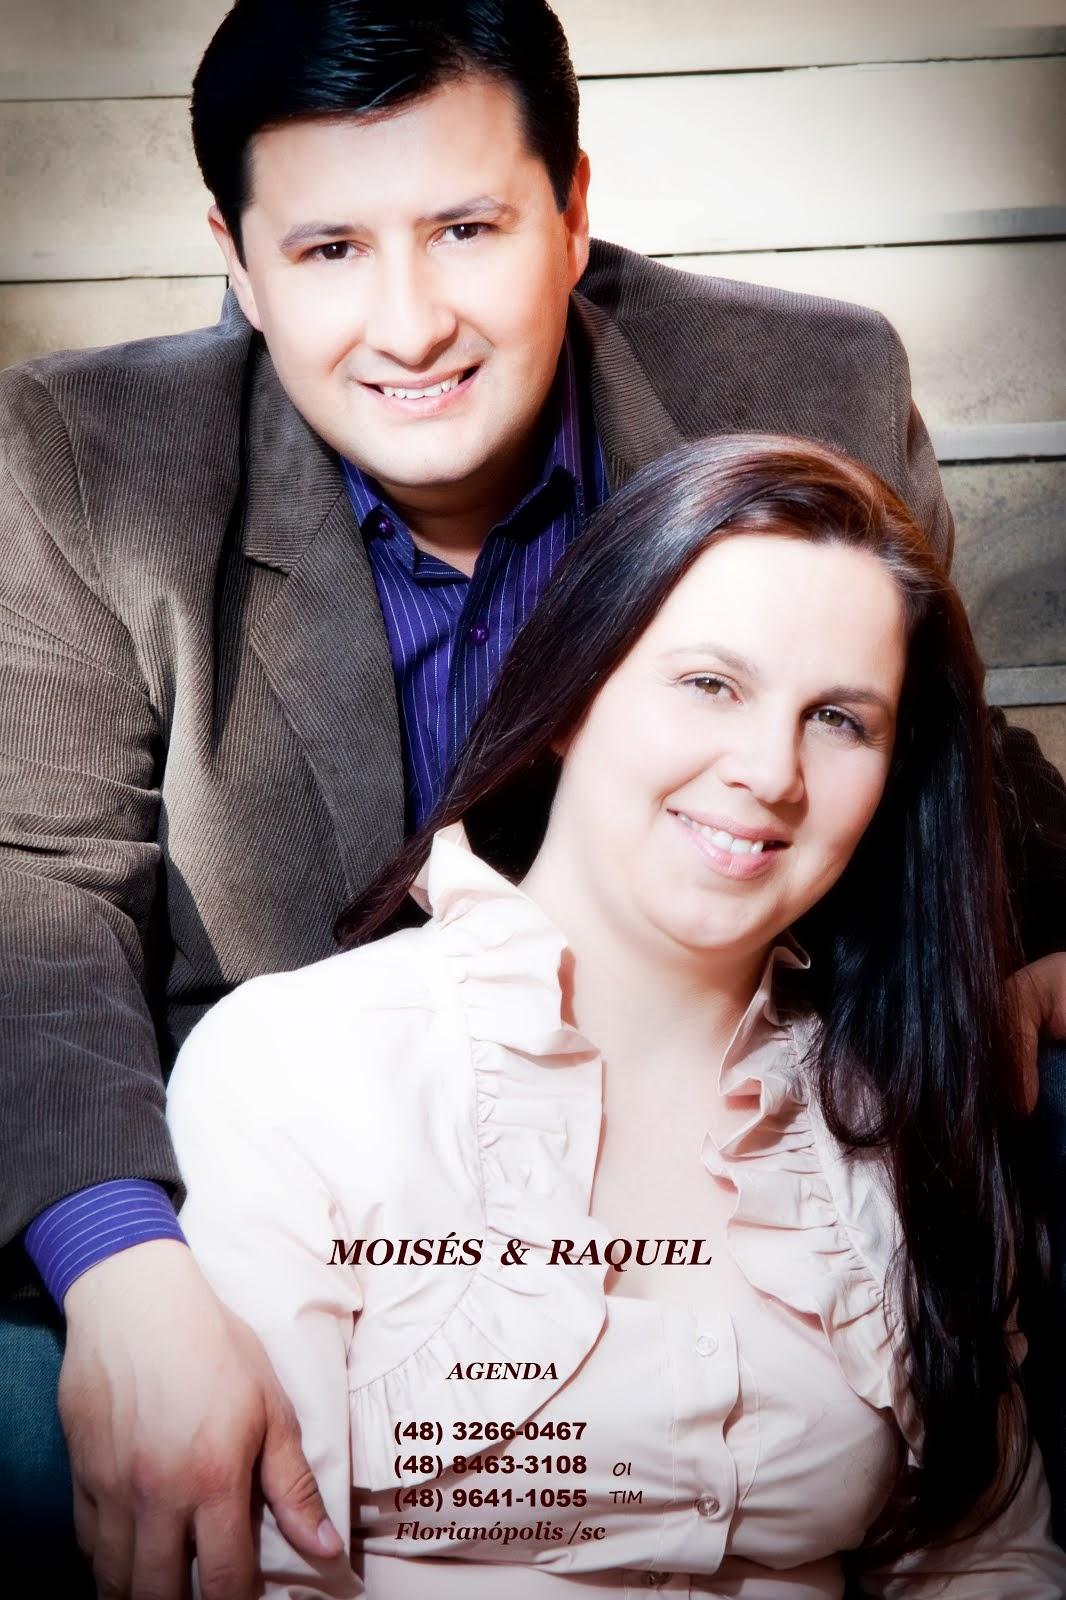 Moisés & Raquel